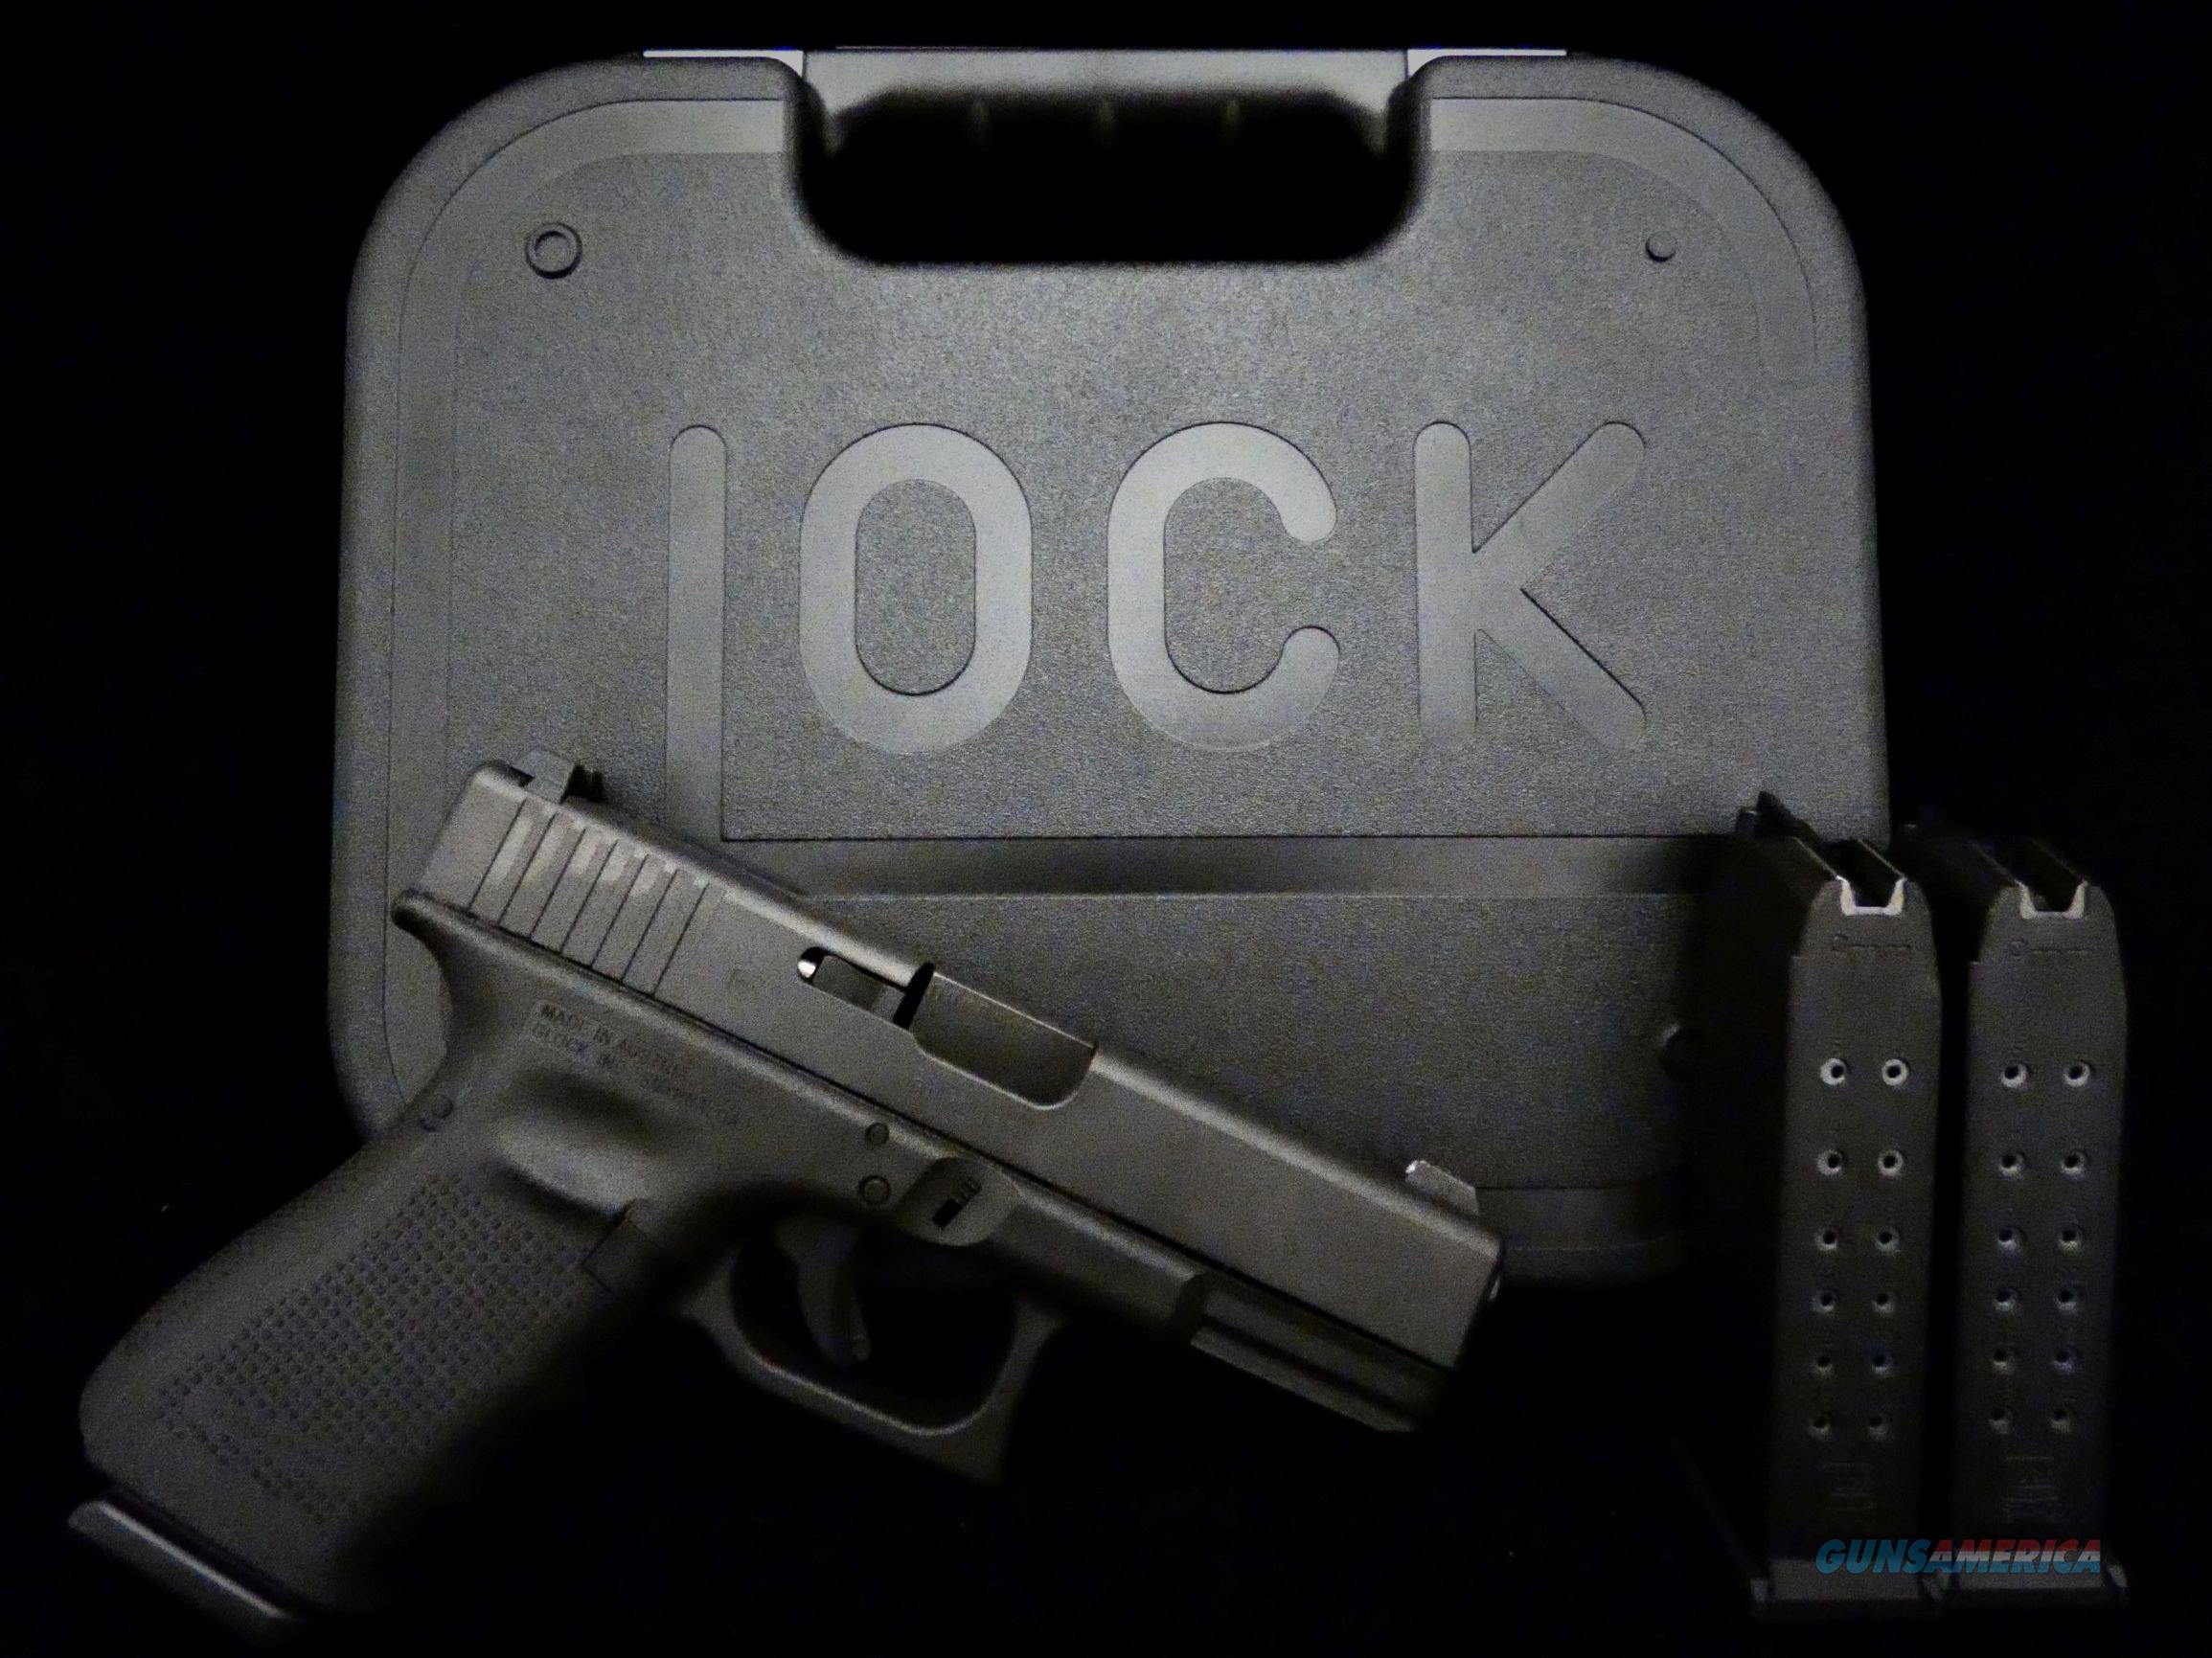 Brand New Glock 19 Gen4 9mm 3 mags   Guns > Pistols > Glock Pistols > 19/19X